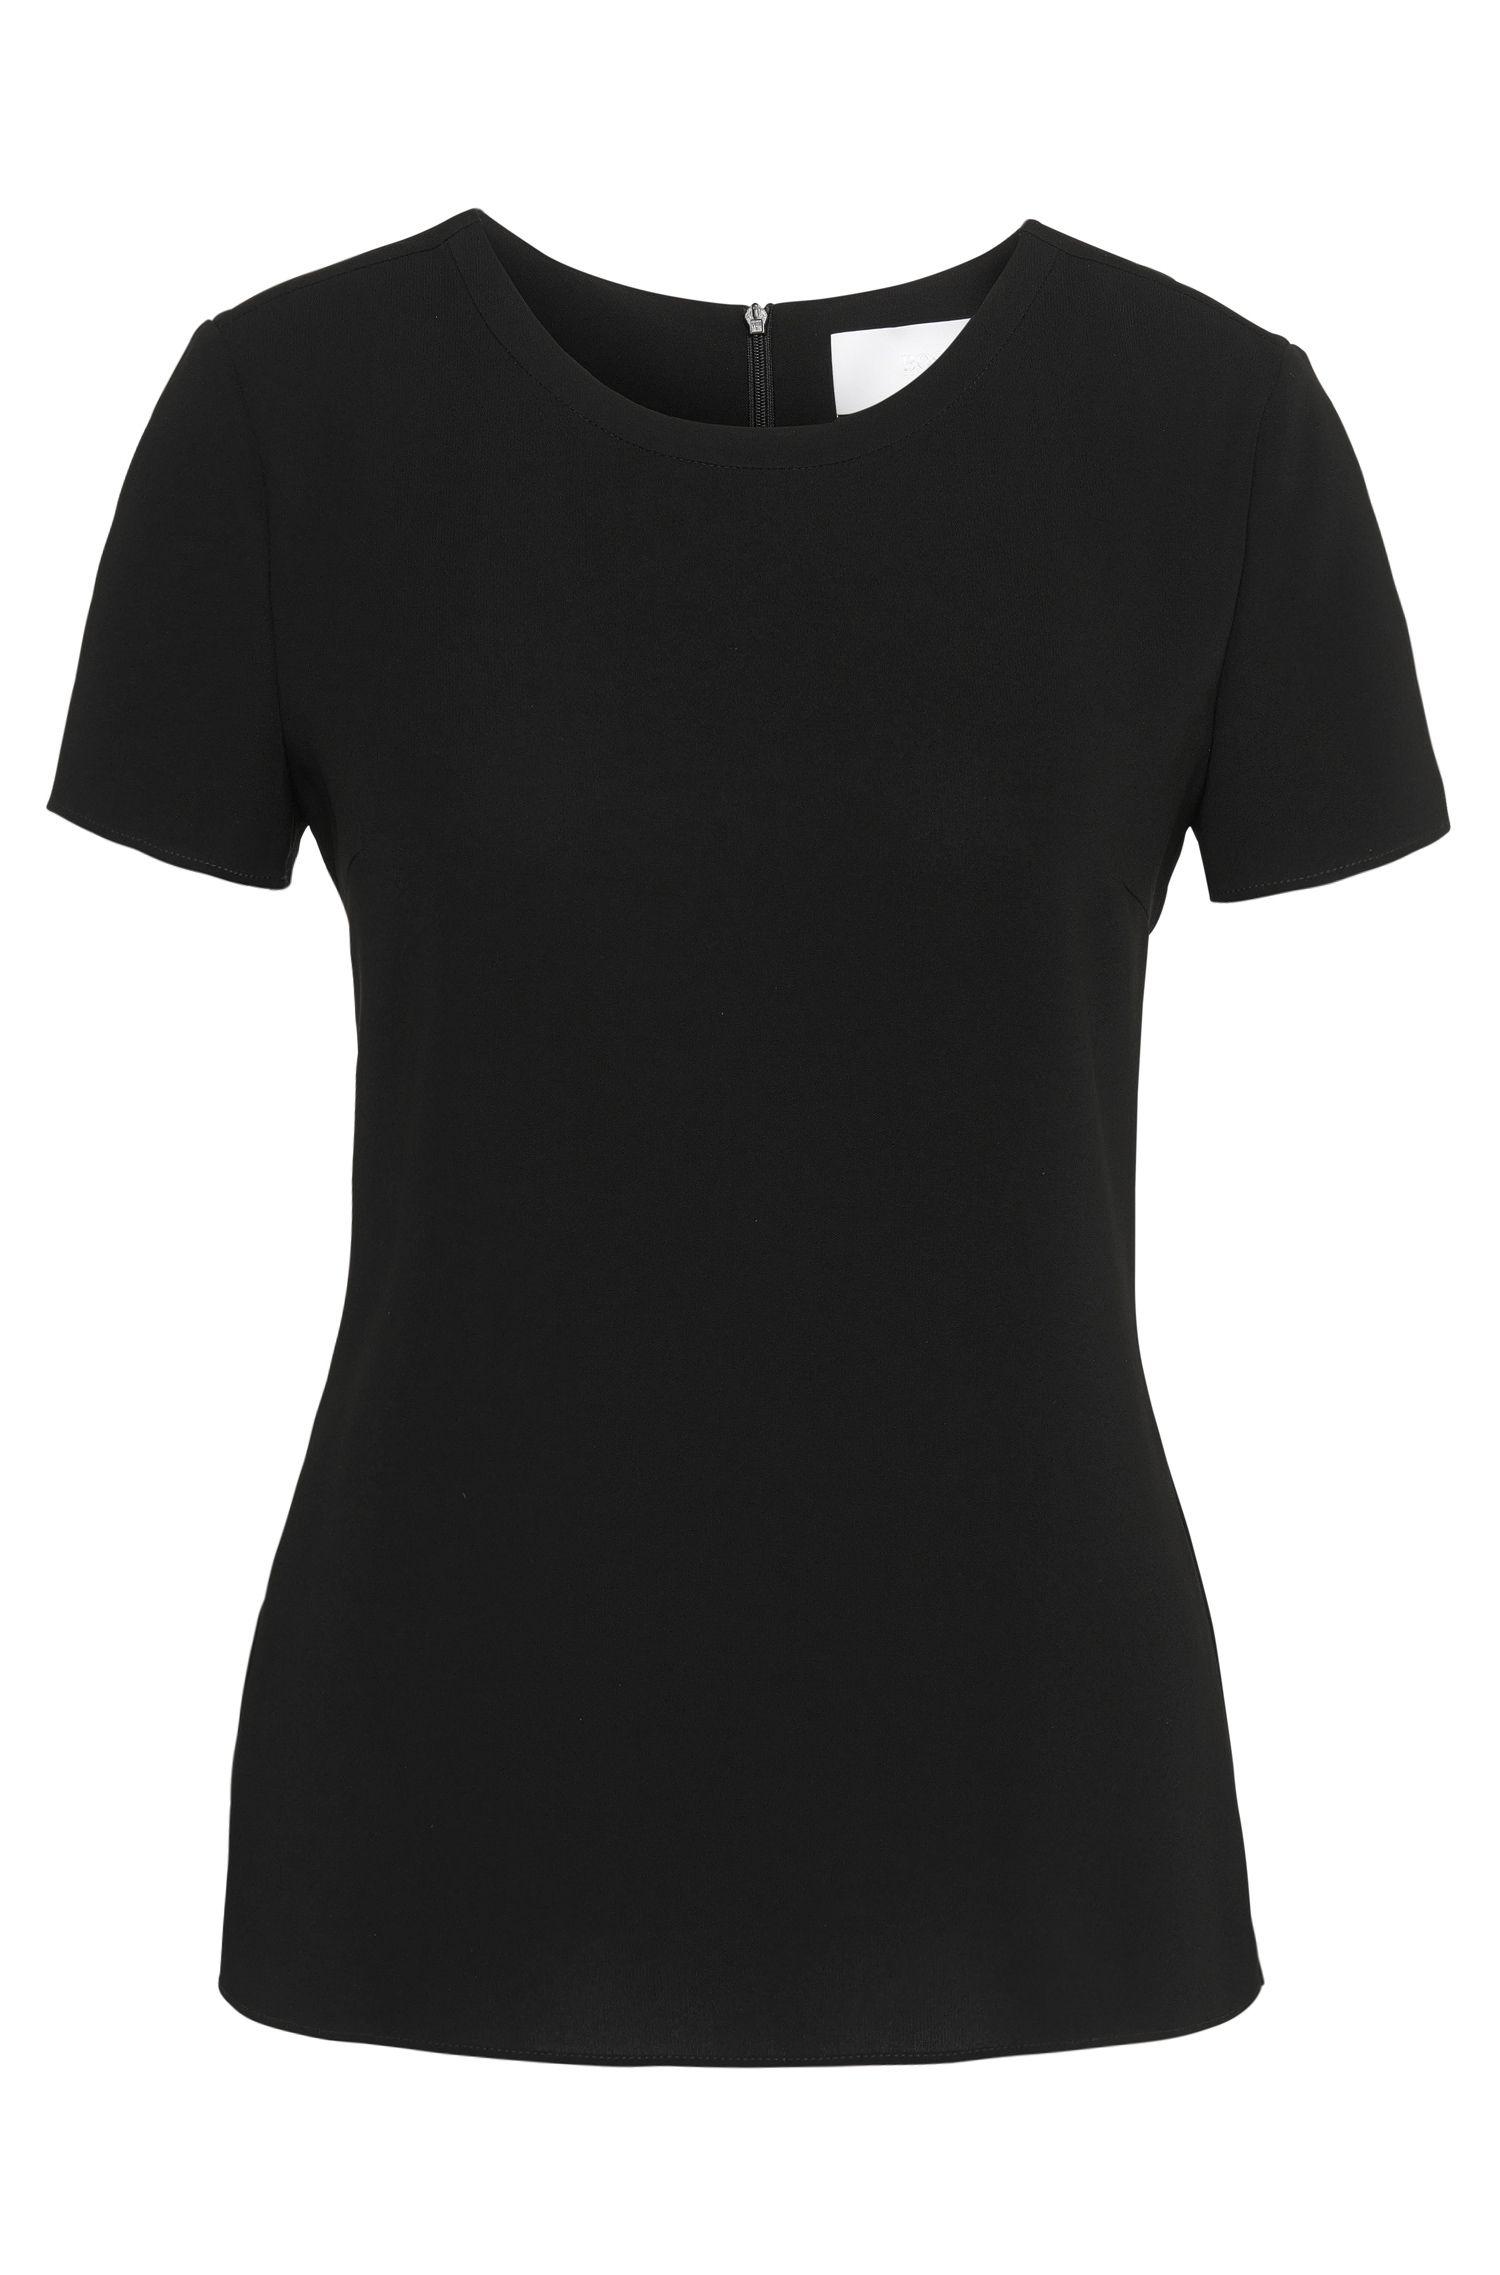 Weich fallendes Krepp-Top von BOSS Womenswear Fundamentals